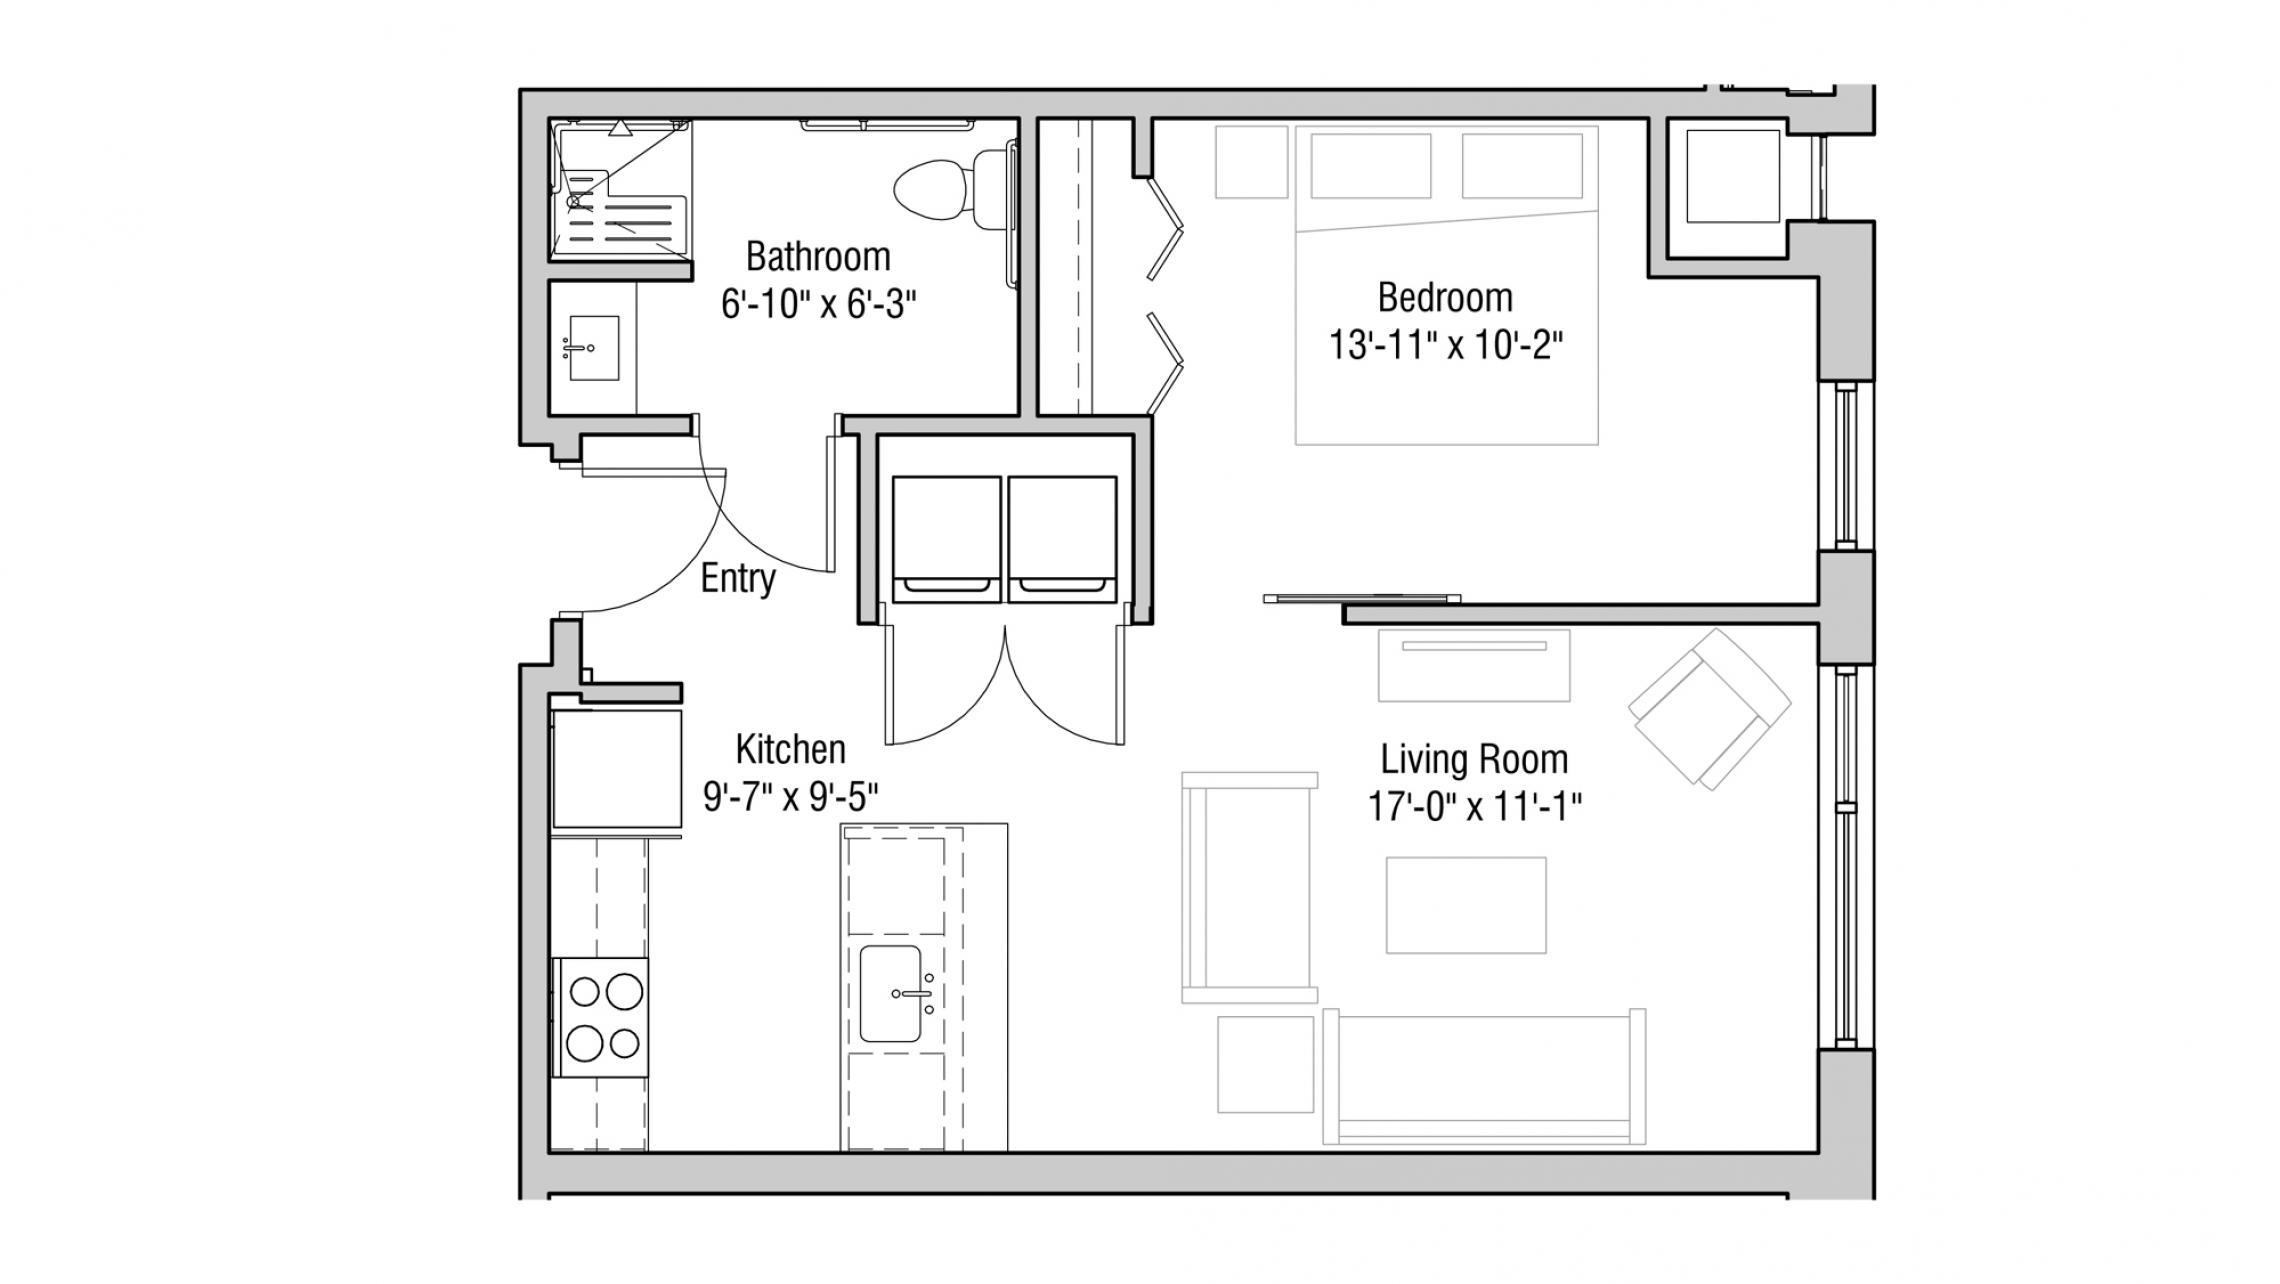 ULI Quarter Row 213 - One Bedroom, One Bathroom